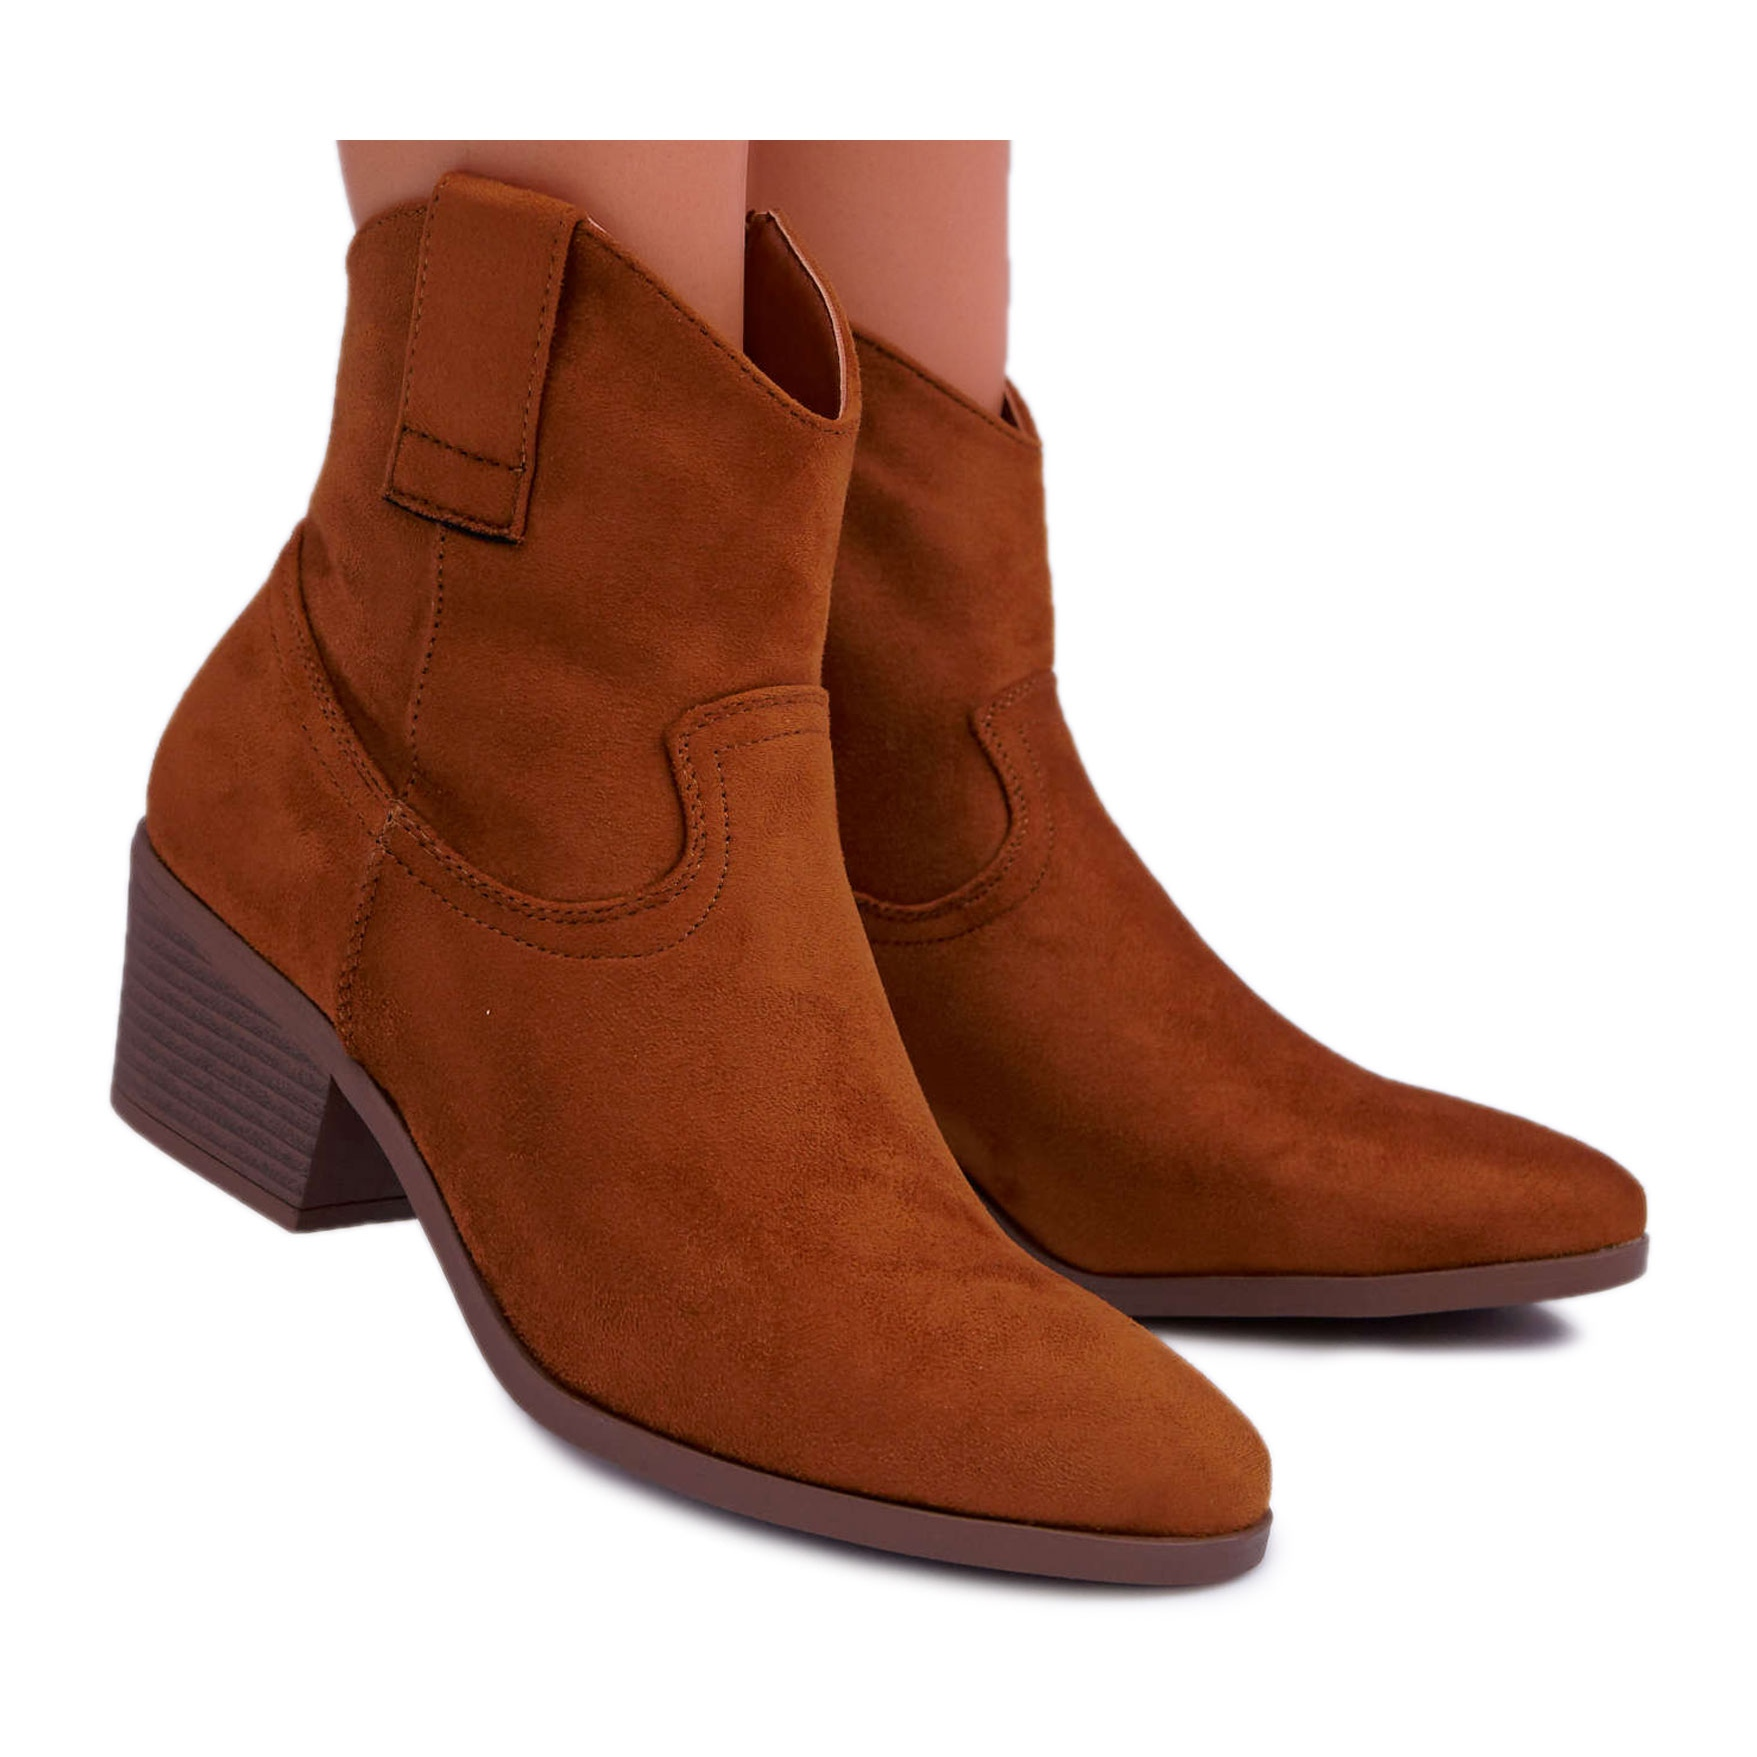 BUGO Boots Women Flat Heel Cowboy Boots